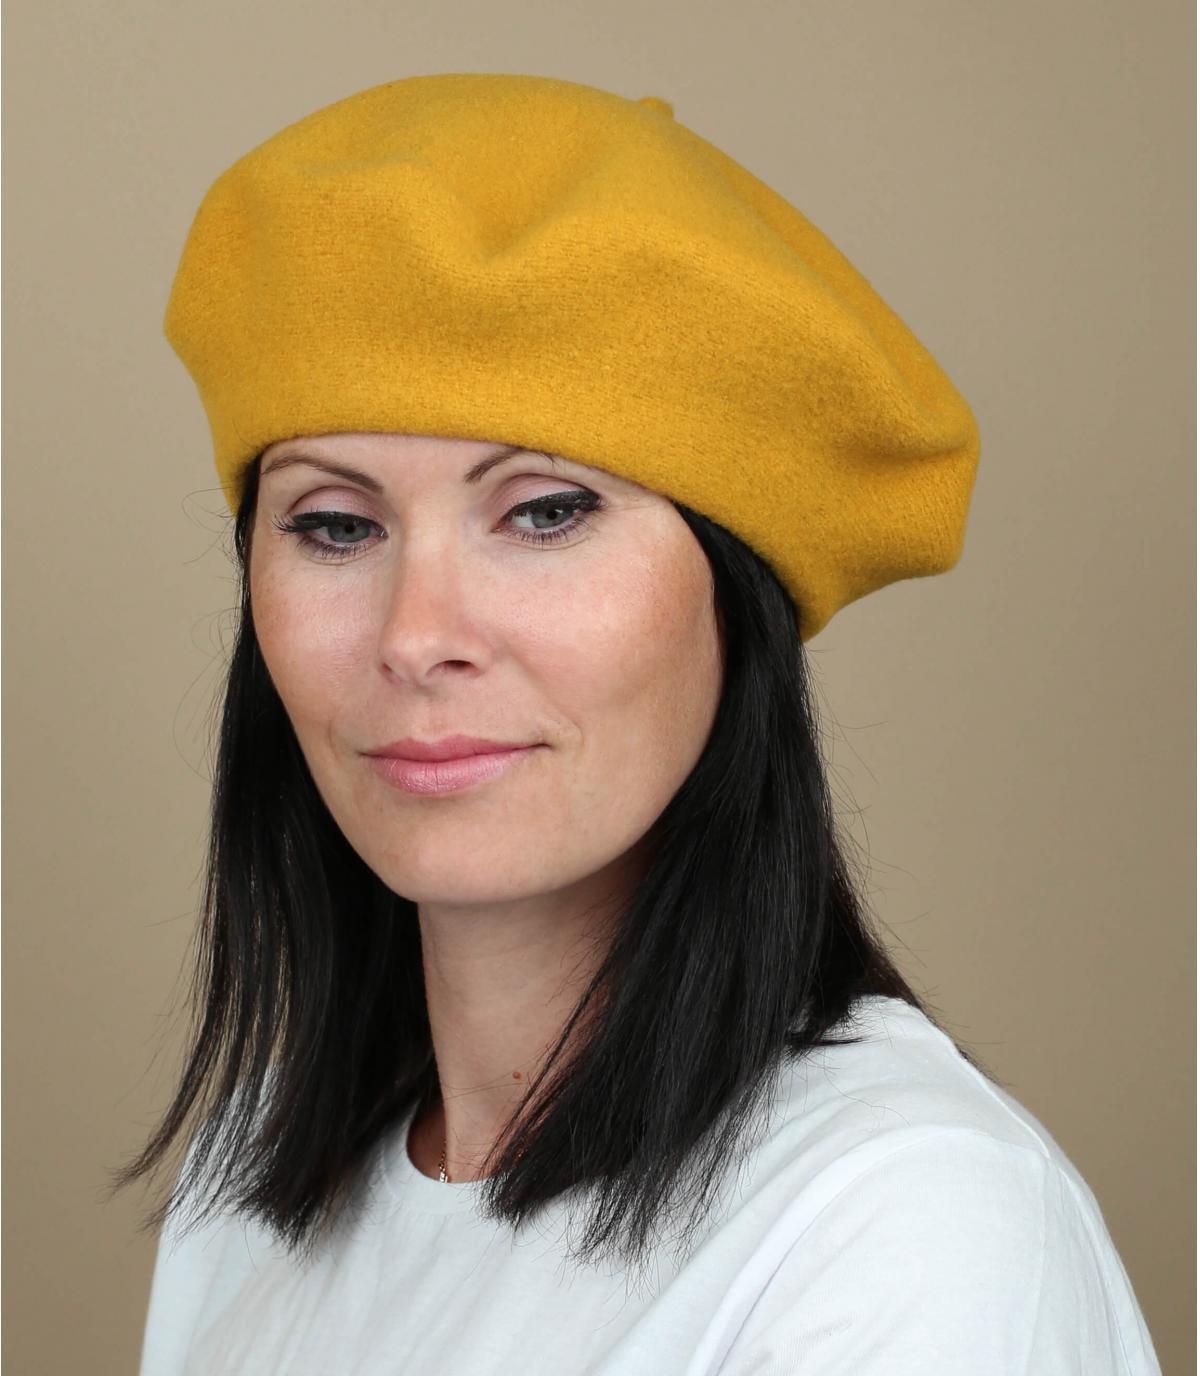 Mosterd franse baret